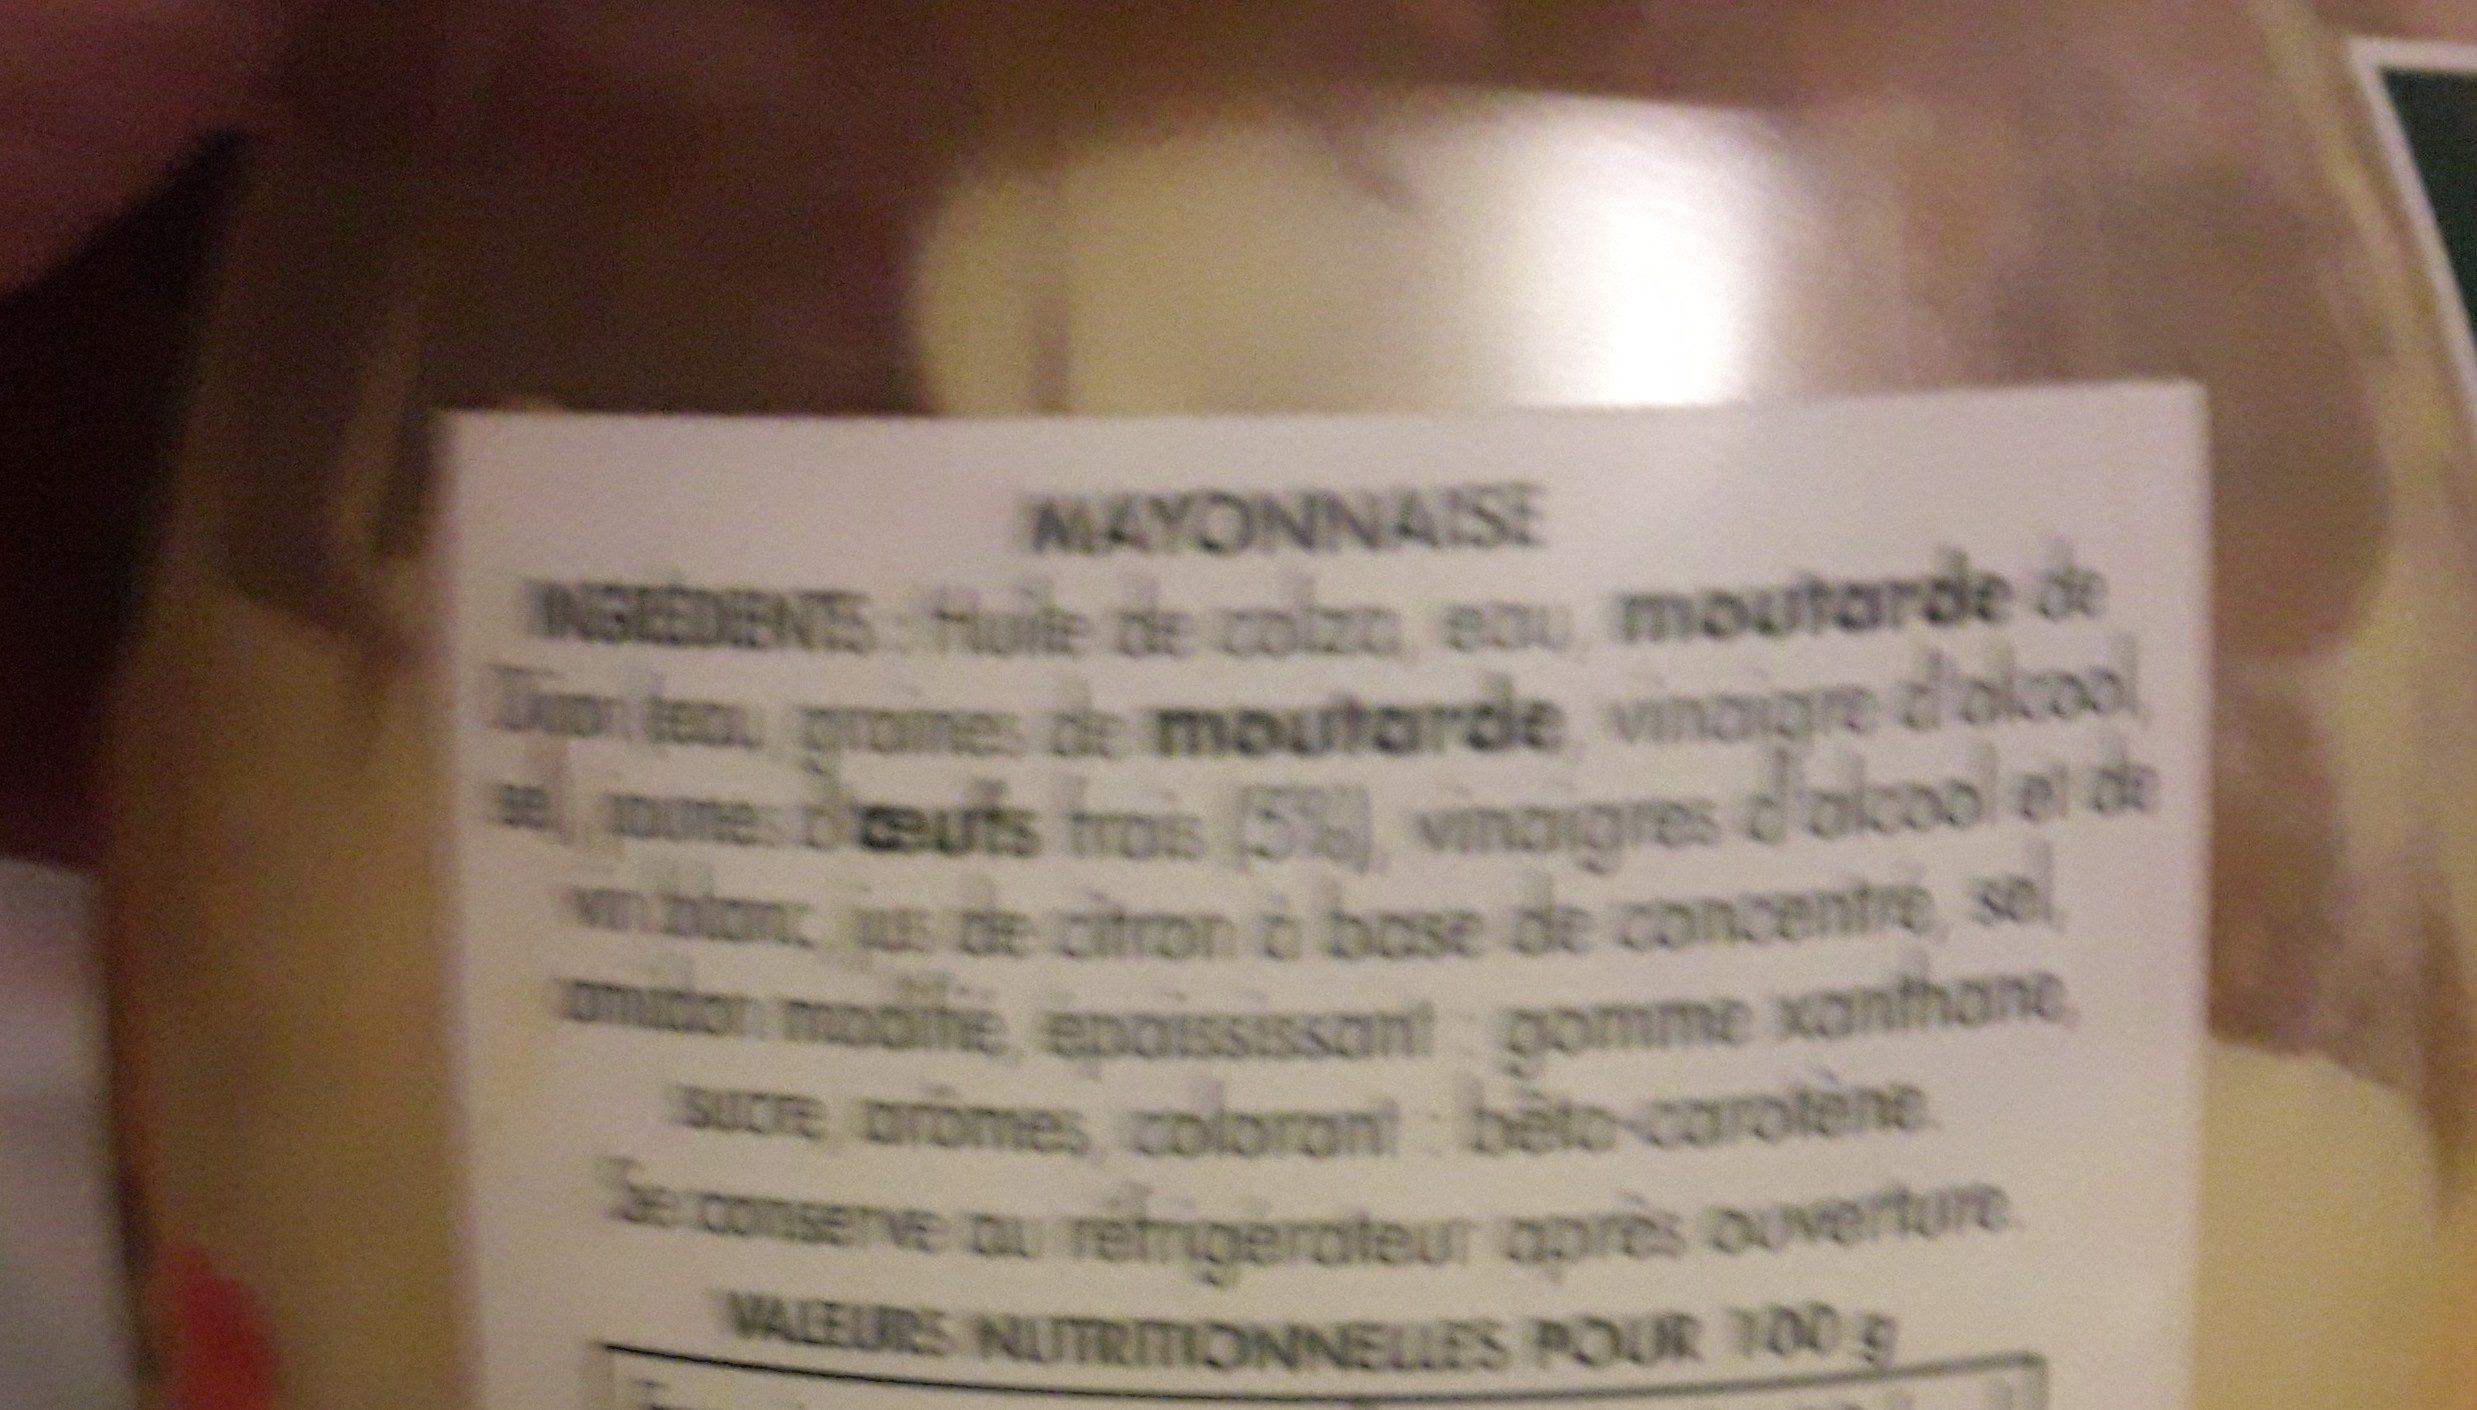 Mayo 770 g Bénédicta - Ingredients - fr